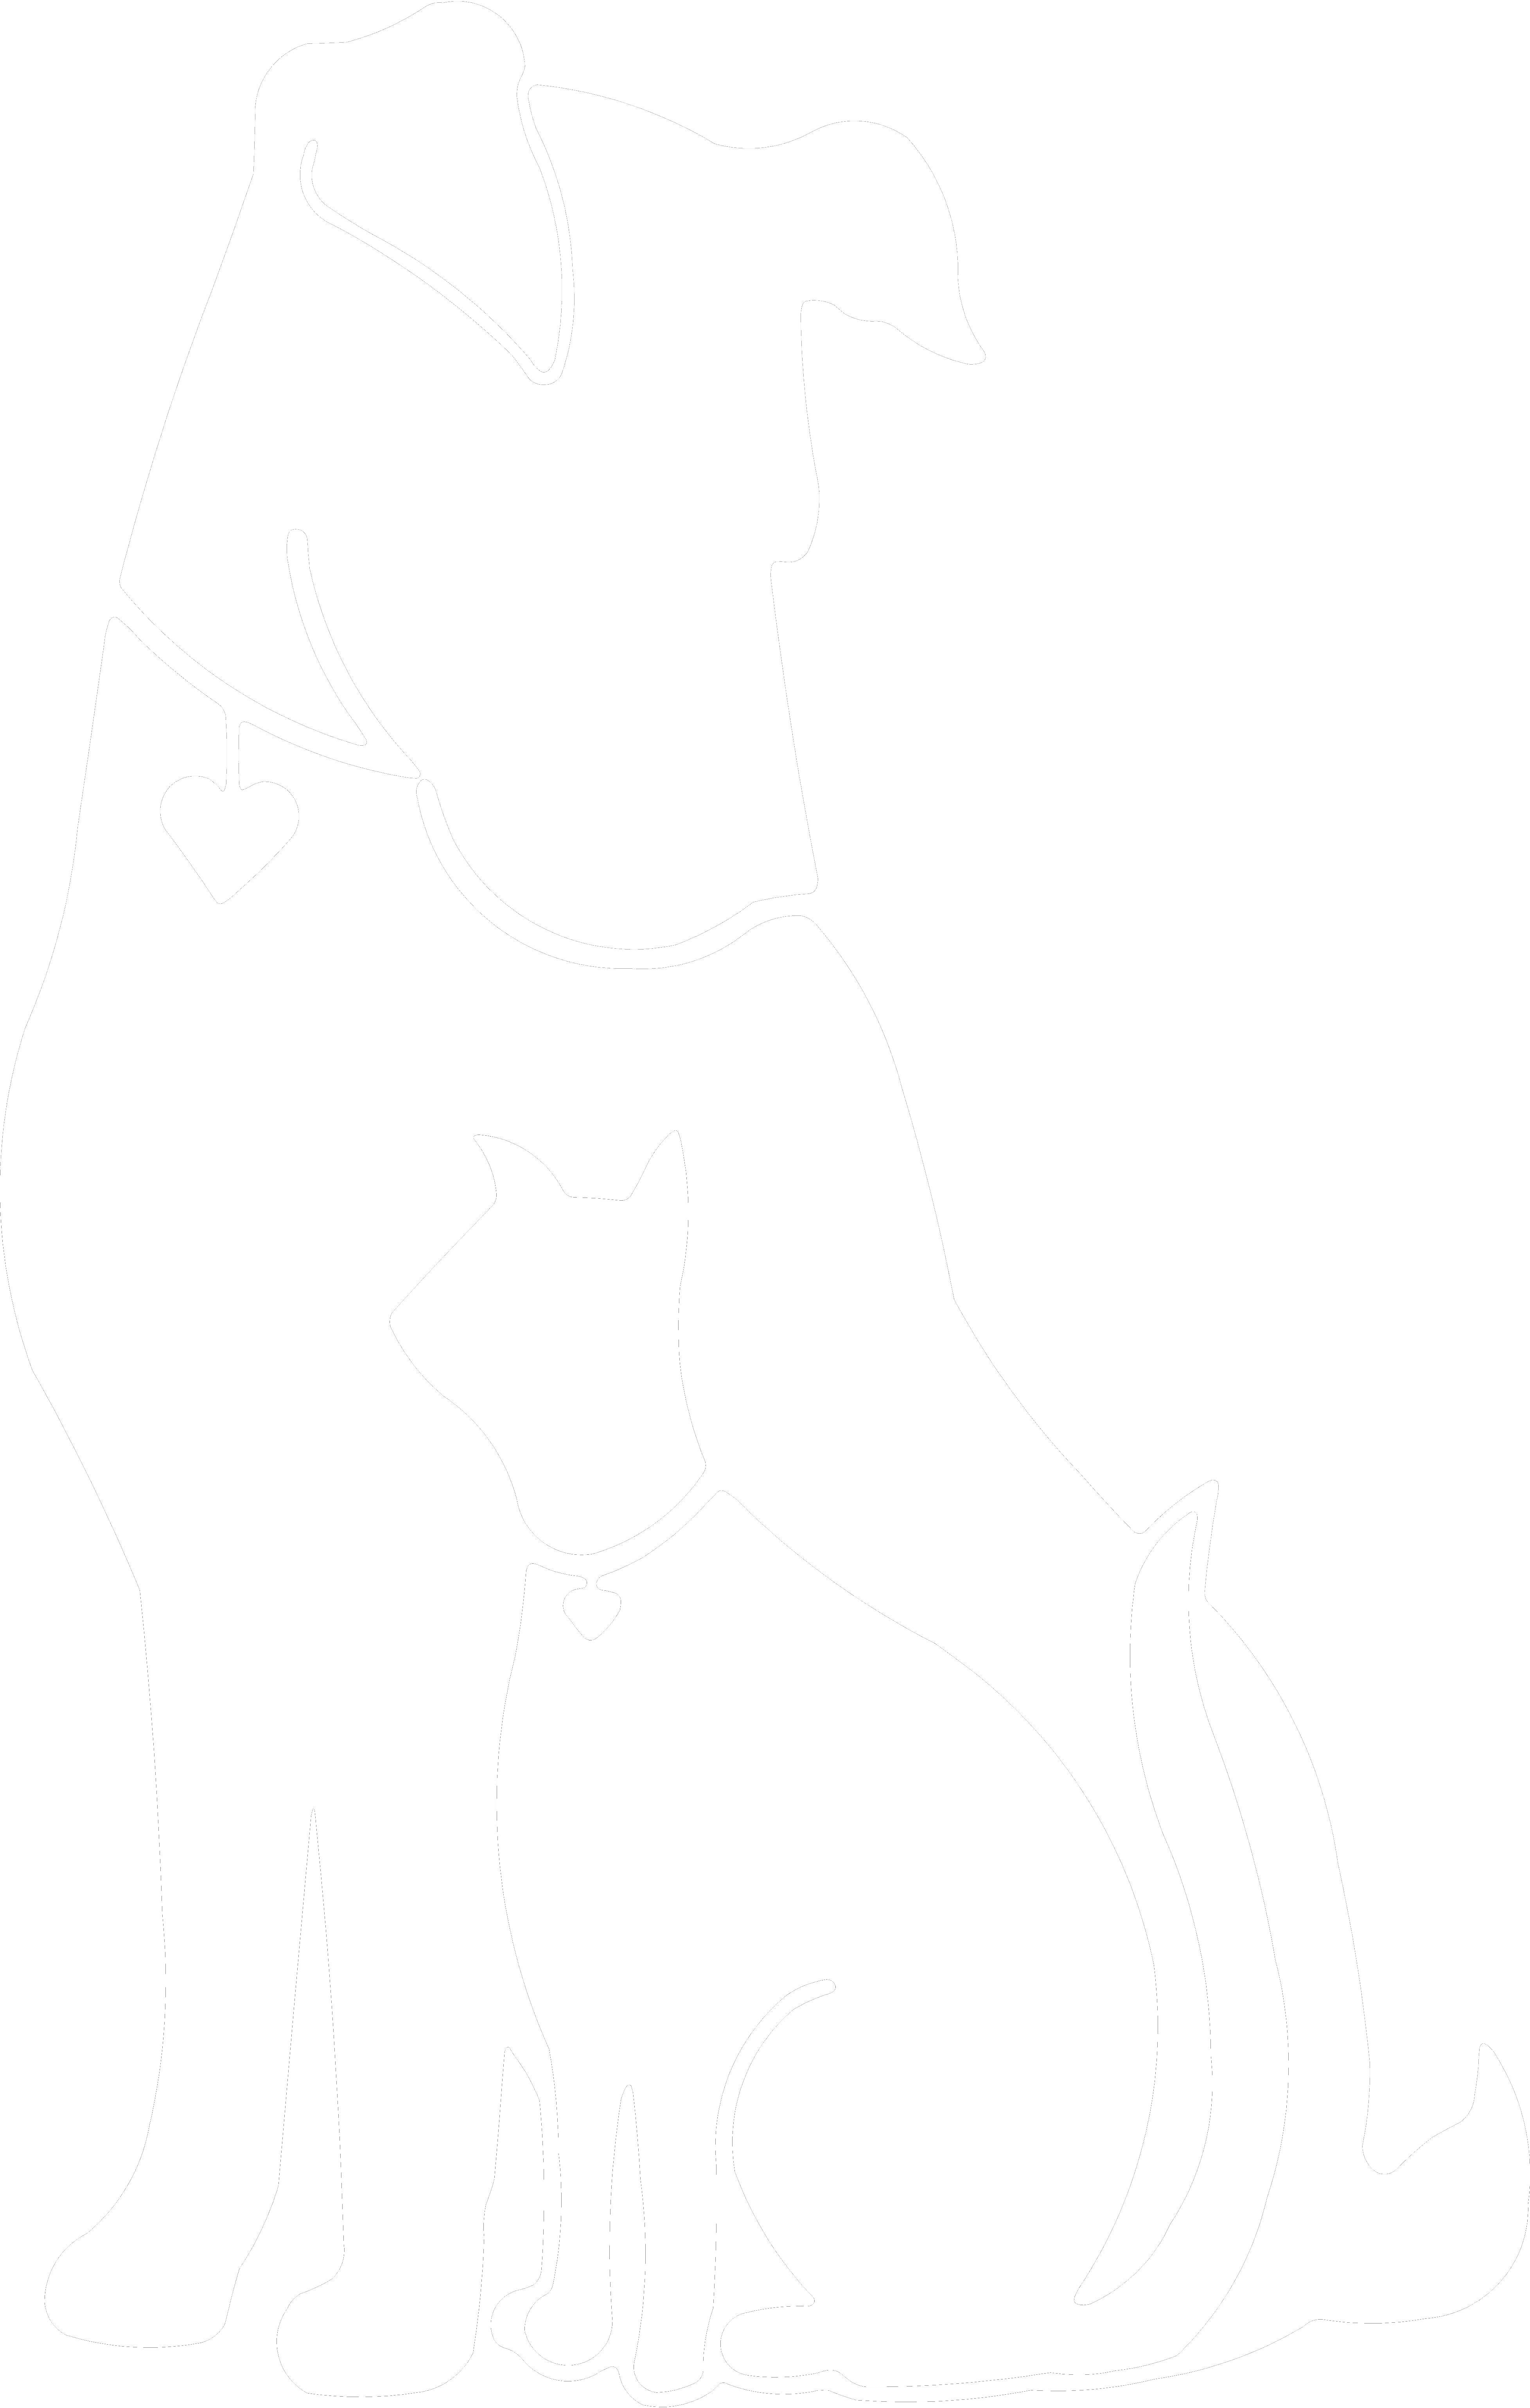 Dog And Cat Black Background